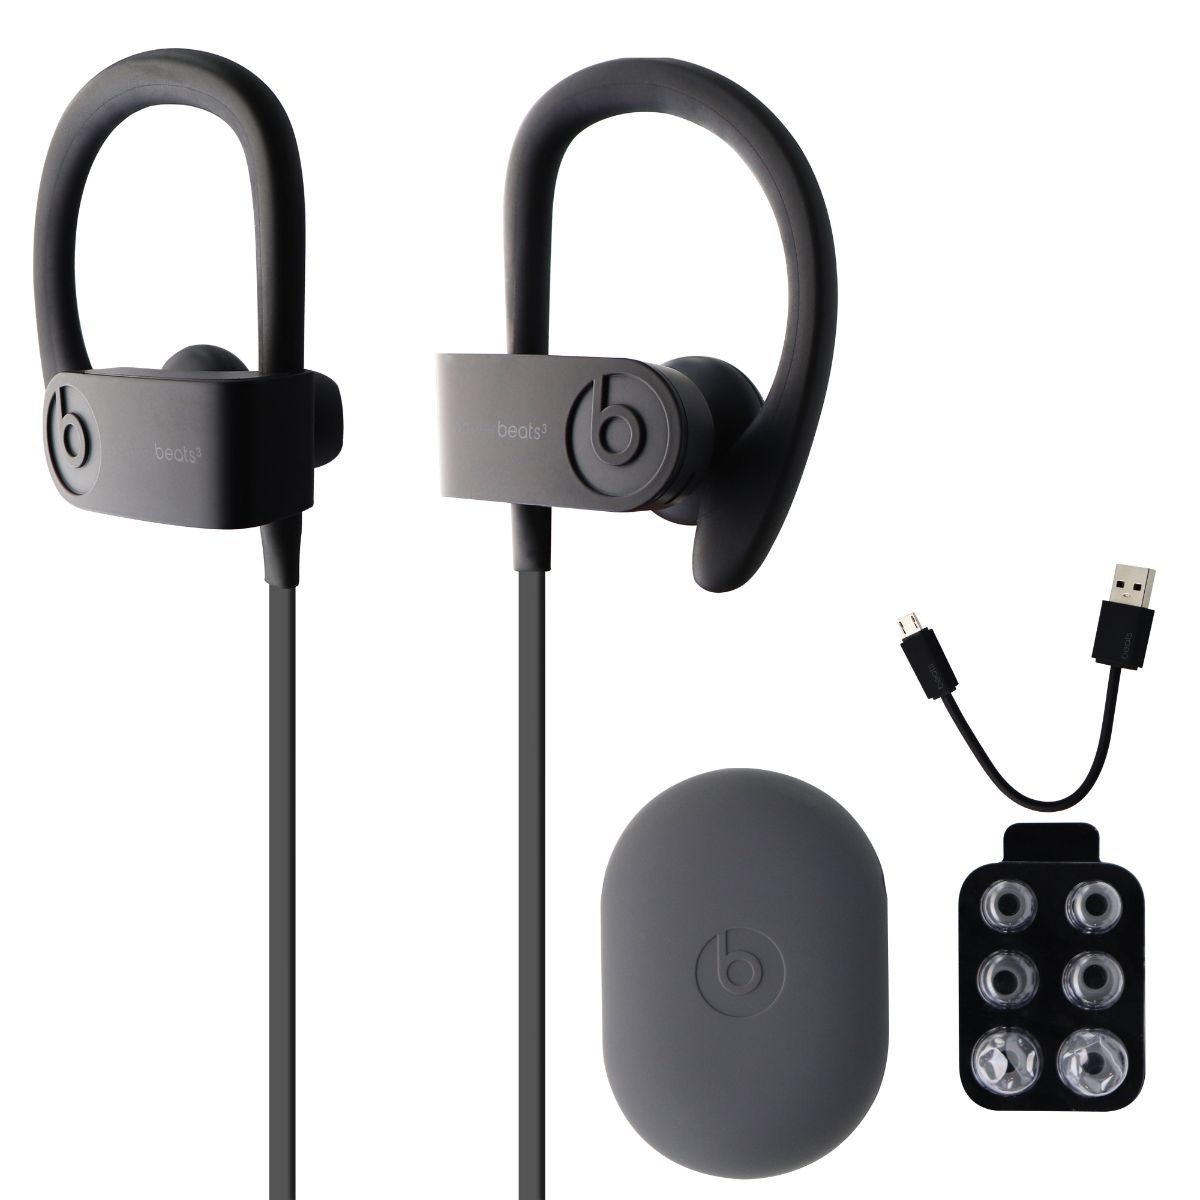 Beats Powerbeats3 Series Wireless Ear-Hook Headphones - Asphalt Gray (MPXM2LL/A)